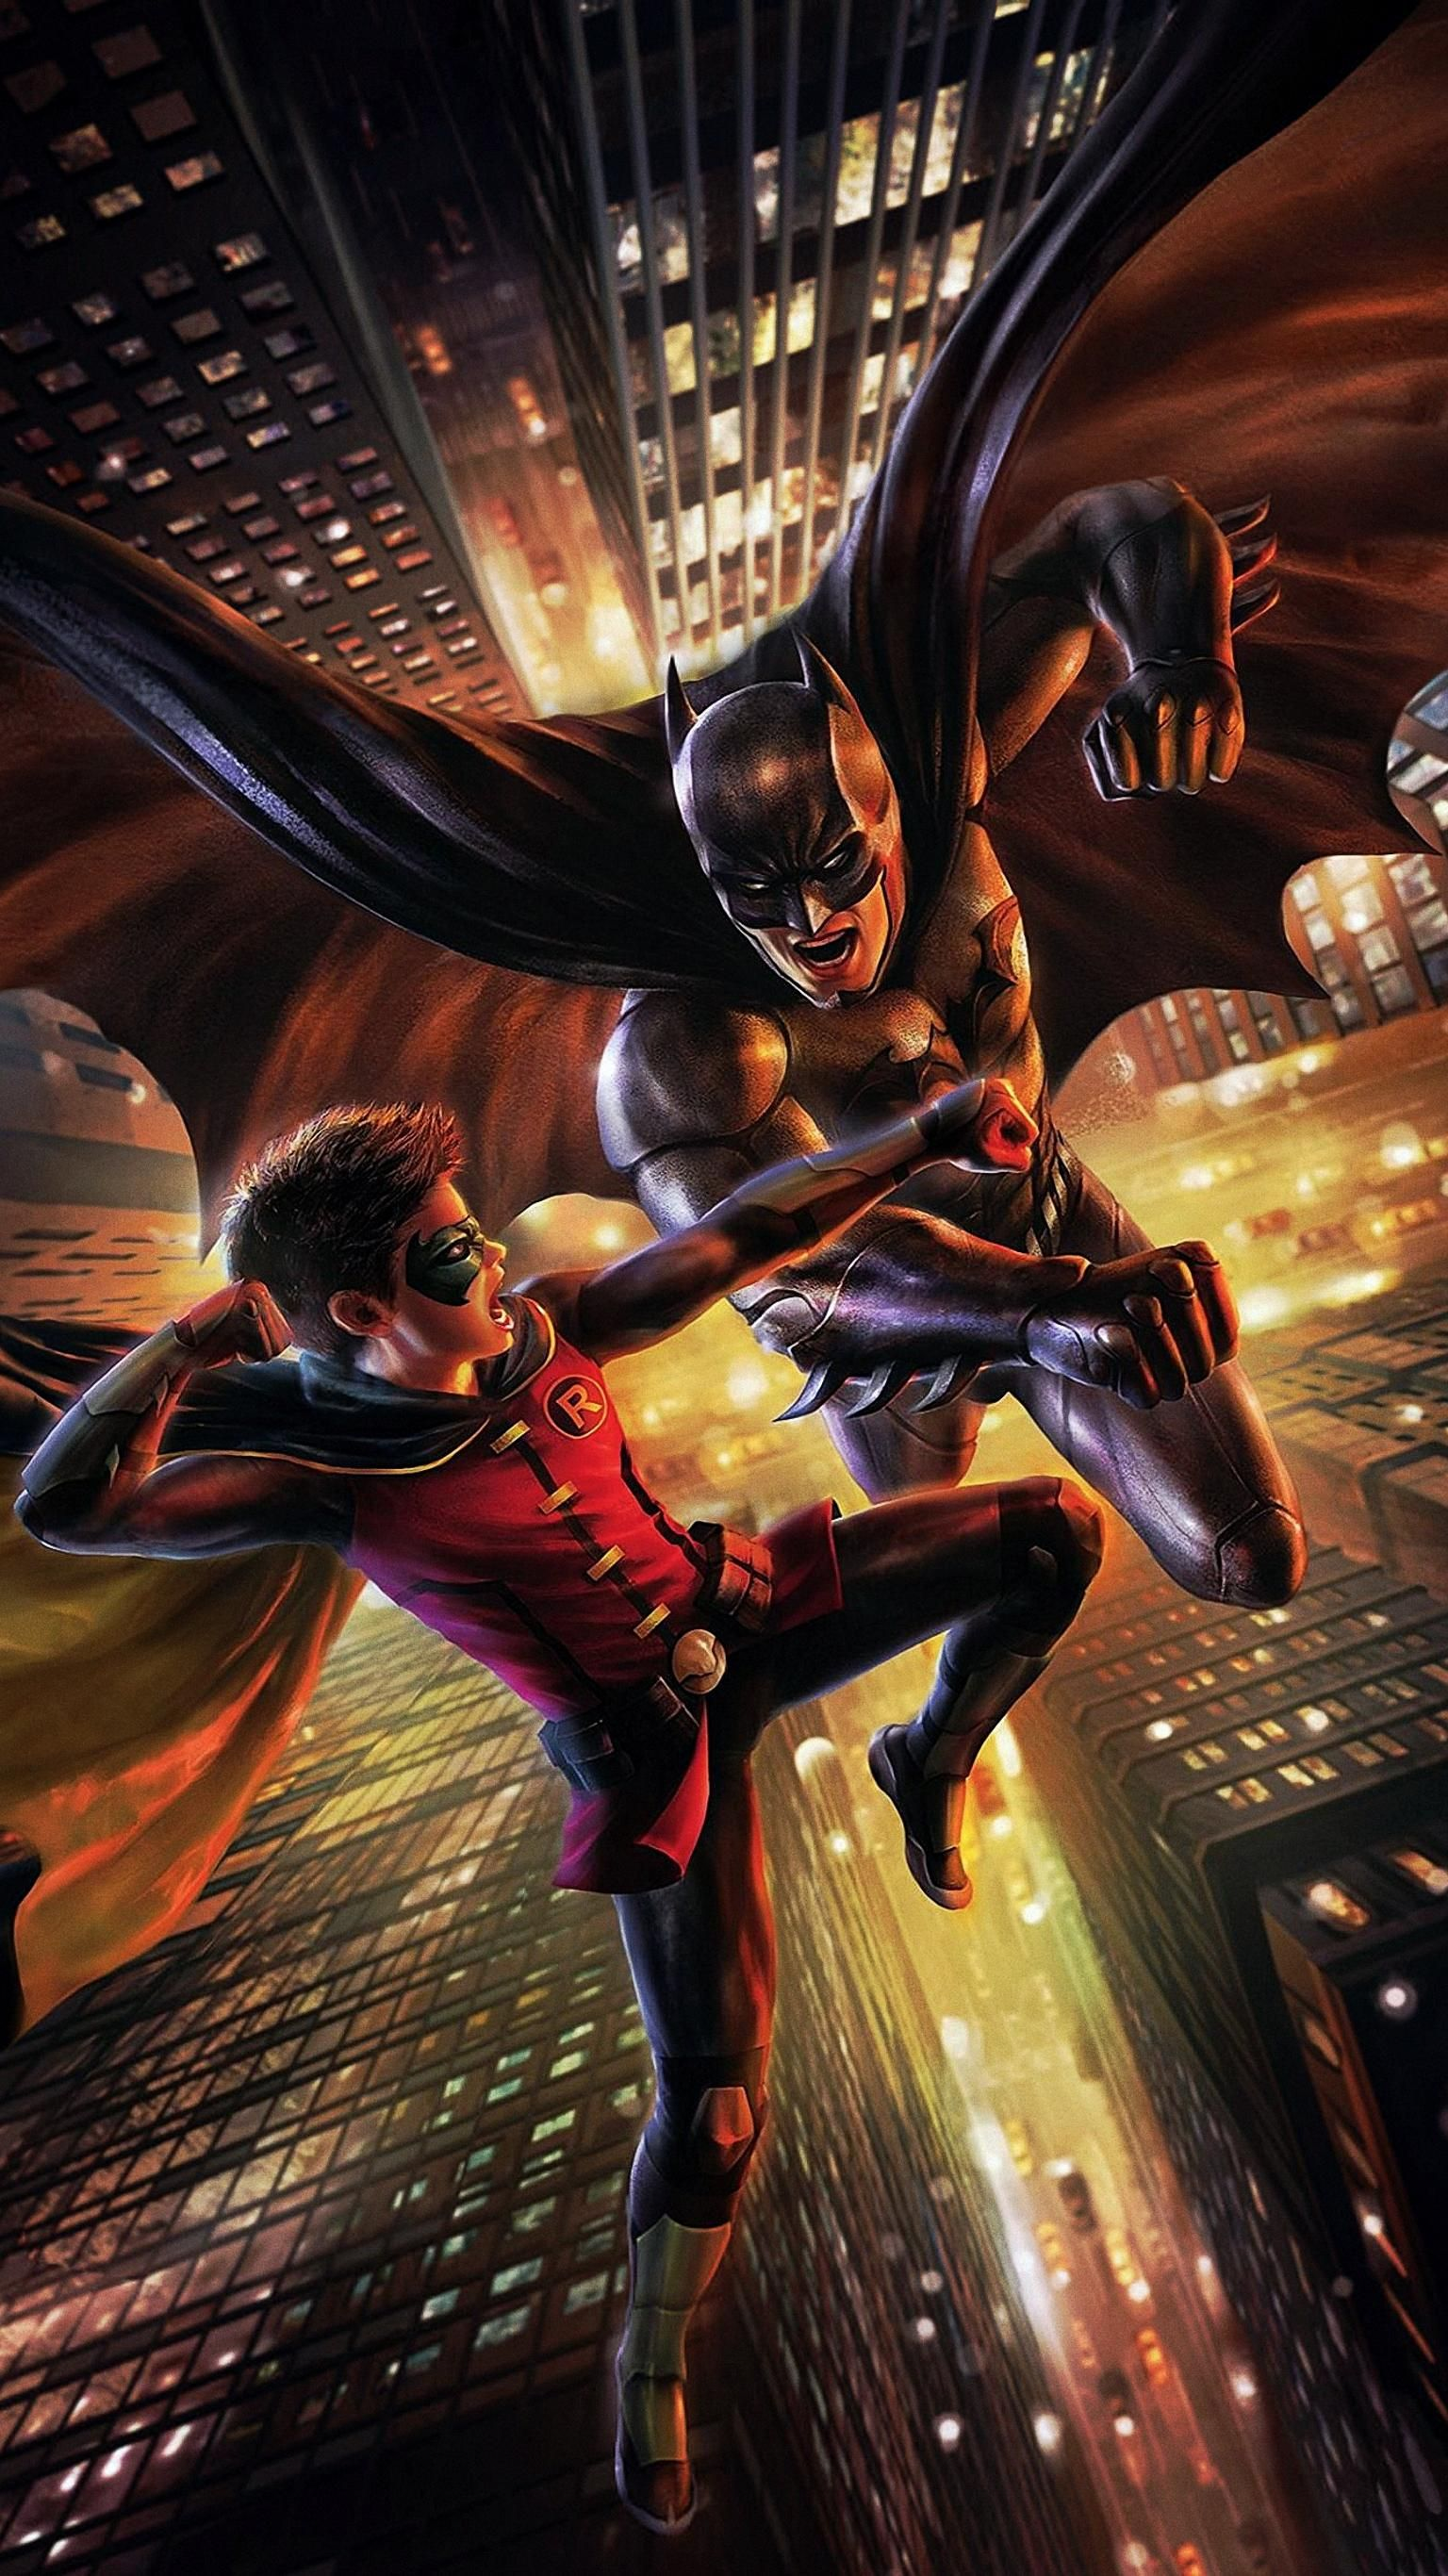 Batman Vs Robin 2015 Phone Wallpaper Moviemania Batman Vs Robin Batman Artwork Batman Vs